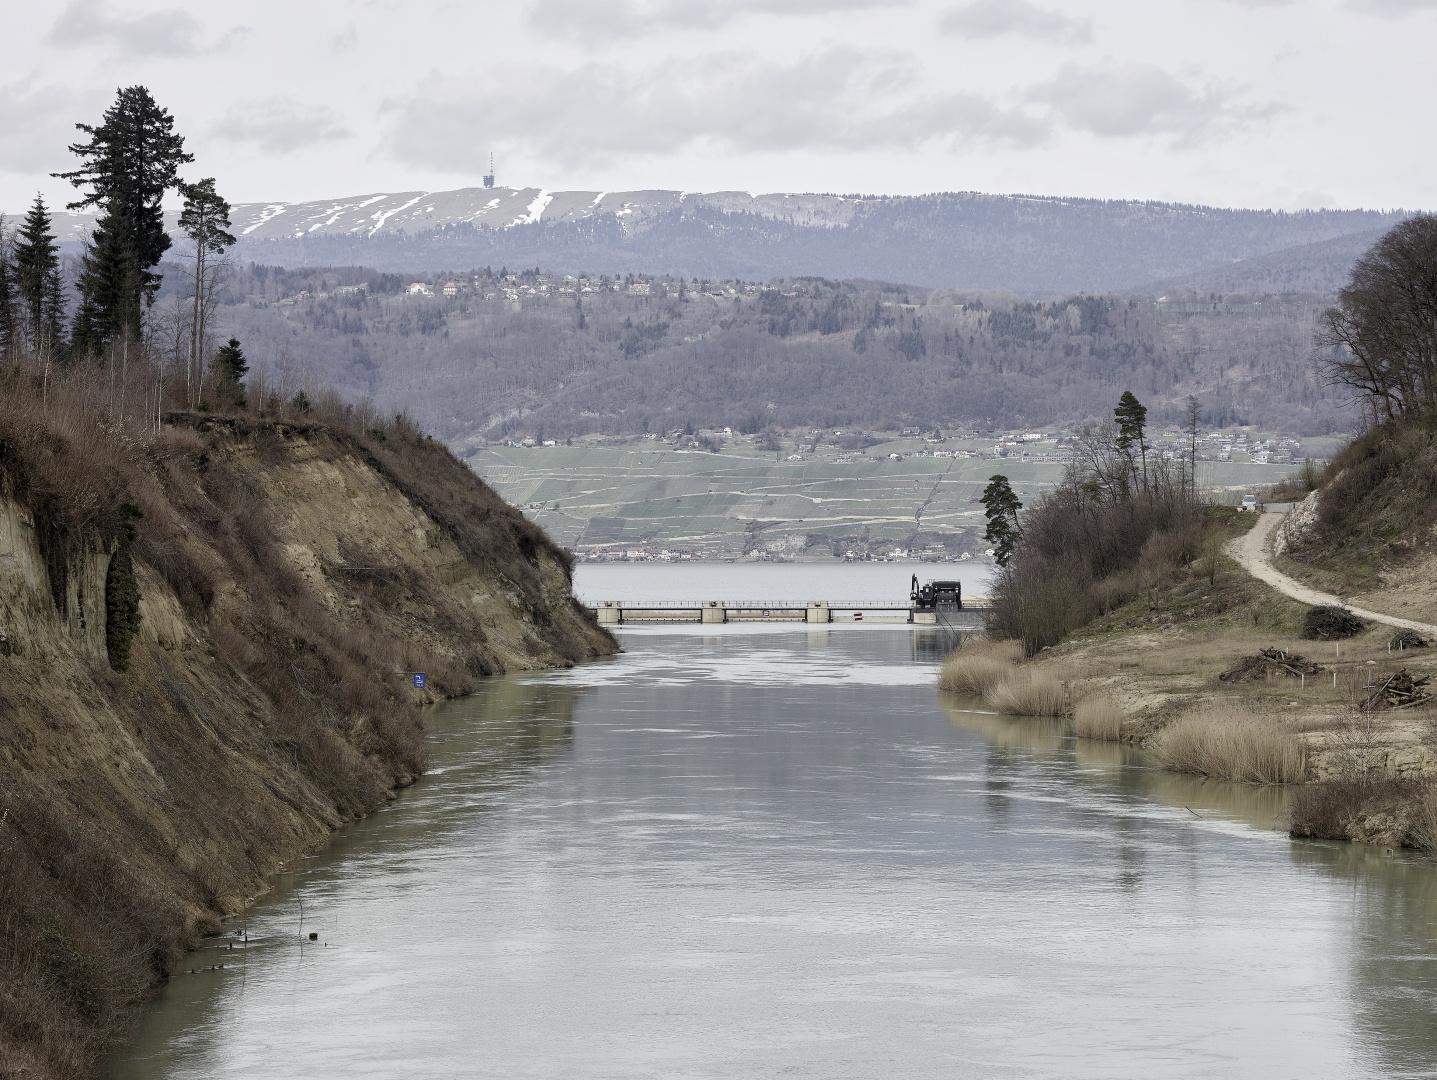 Aare Hagneck Kanal © Kuster Frey, Stirnrütistr. 15, 6048 Horw